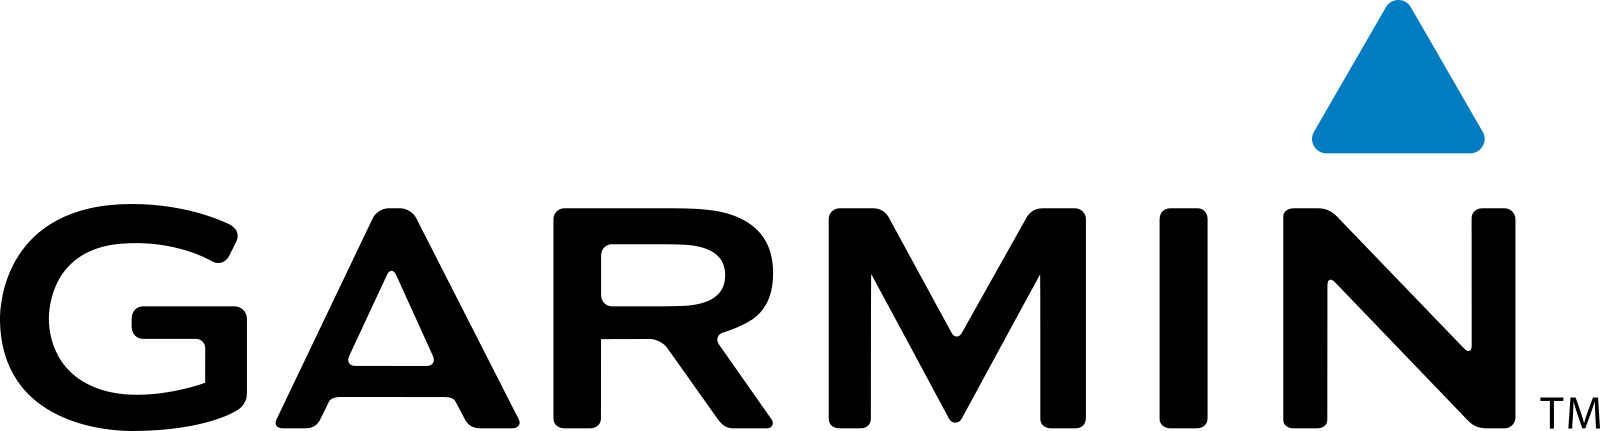 Garmin-logo-4